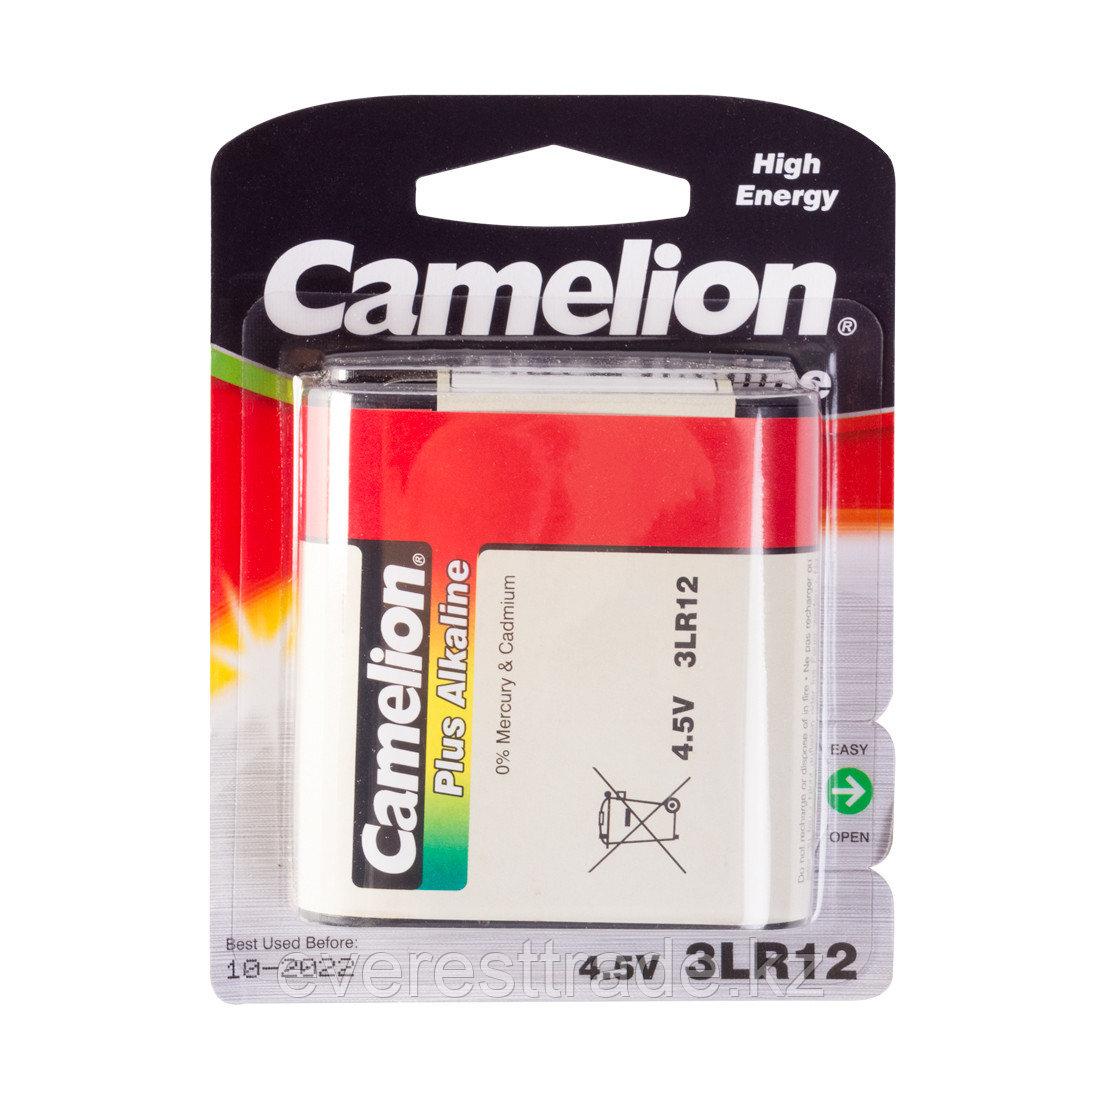 Camelion Батарейка, CAMELION, 3LR12-BP1, Plus Alkaline, 3LR12, 4.5V, 1 шт., Блистер